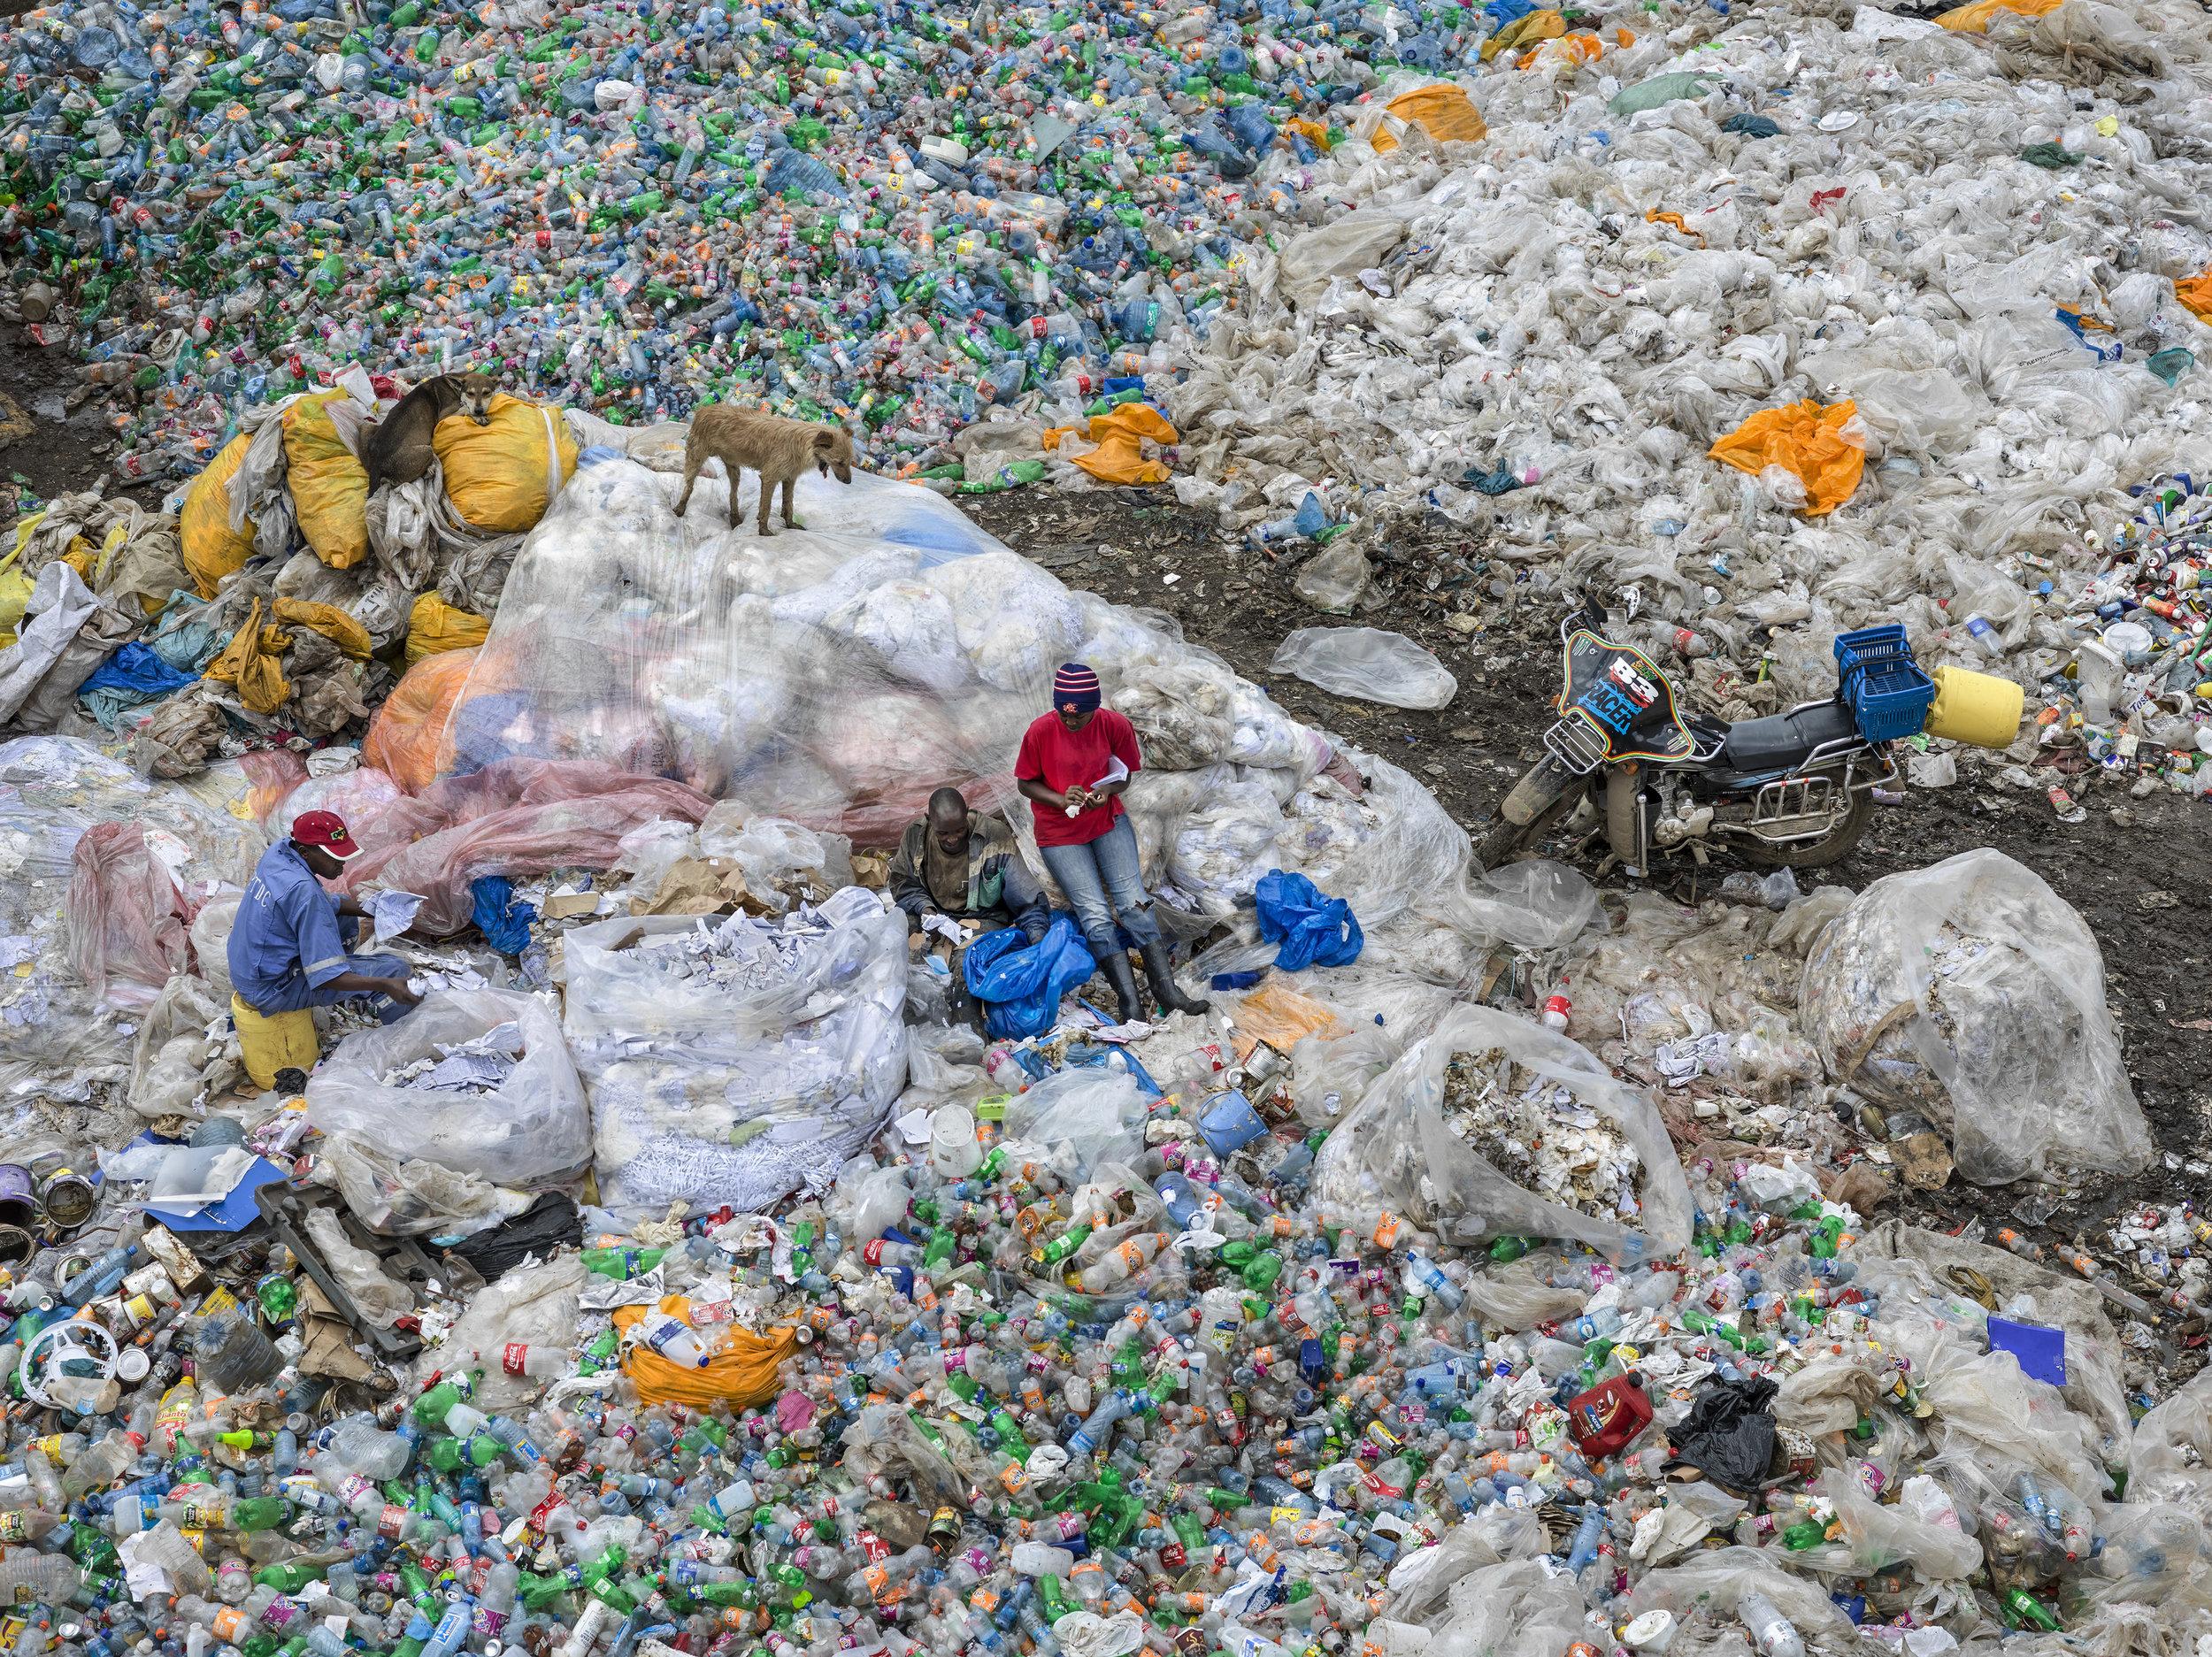 Dandora Landfill #3, Plastics Recycling, Nairobi, Kenya 2016 / Photo: © Edward Burtynsky/courtesy Howard Greenberg and Bryce Wolkowitz Gallery, New York/Nicholas Metivier Gallery, Toronto.